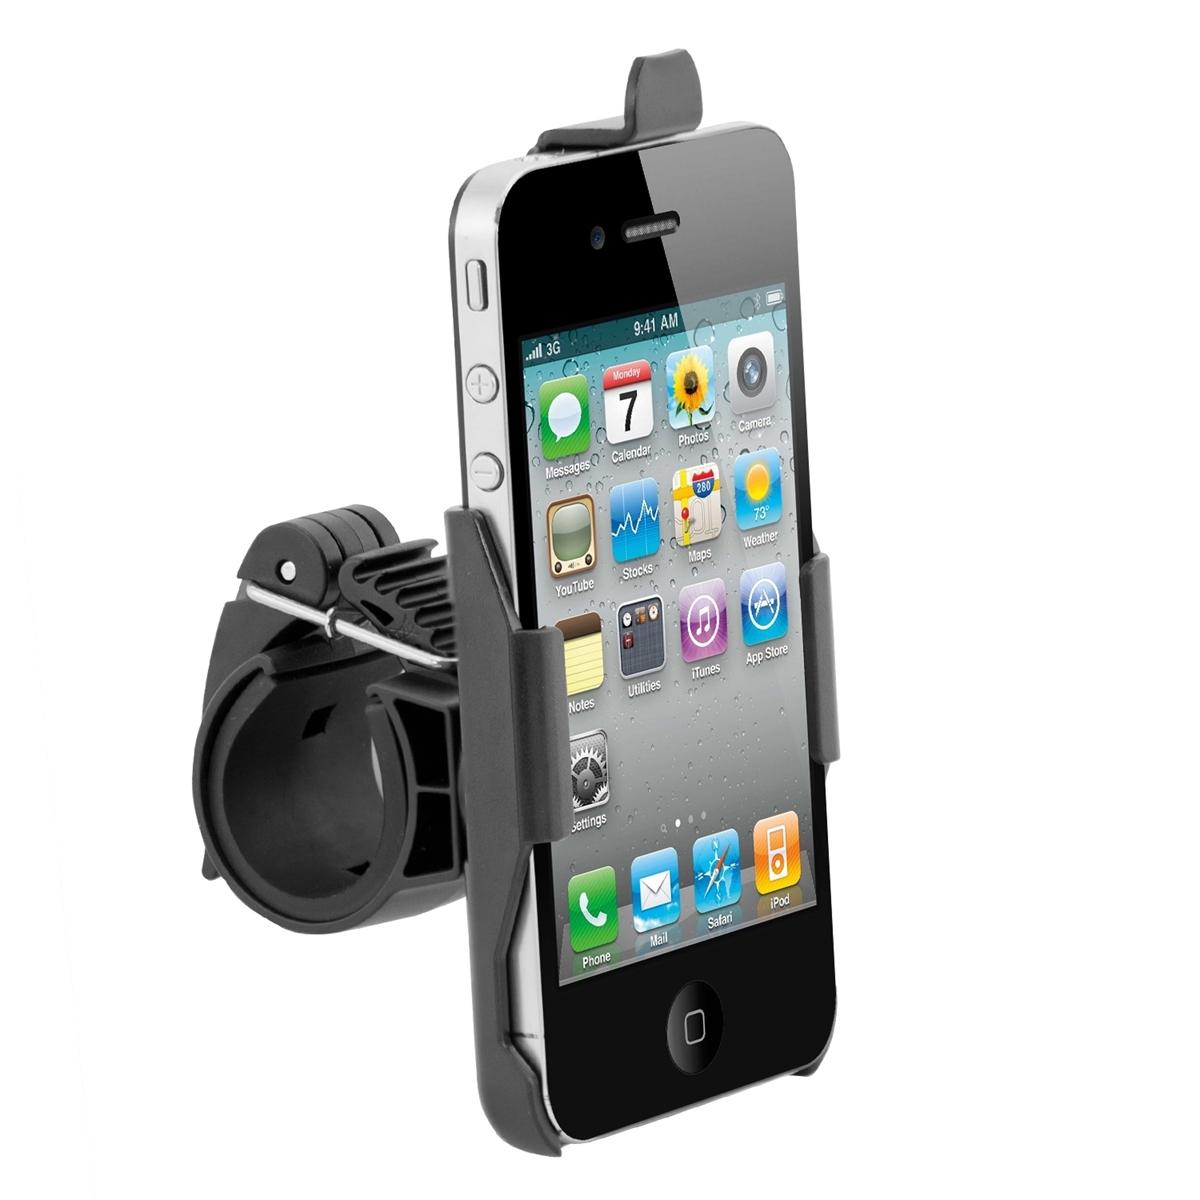 fahrrad halterung f r apple iphone 4 4s halter motorrad. Black Bedroom Furniture Sets. Home Design Ideas